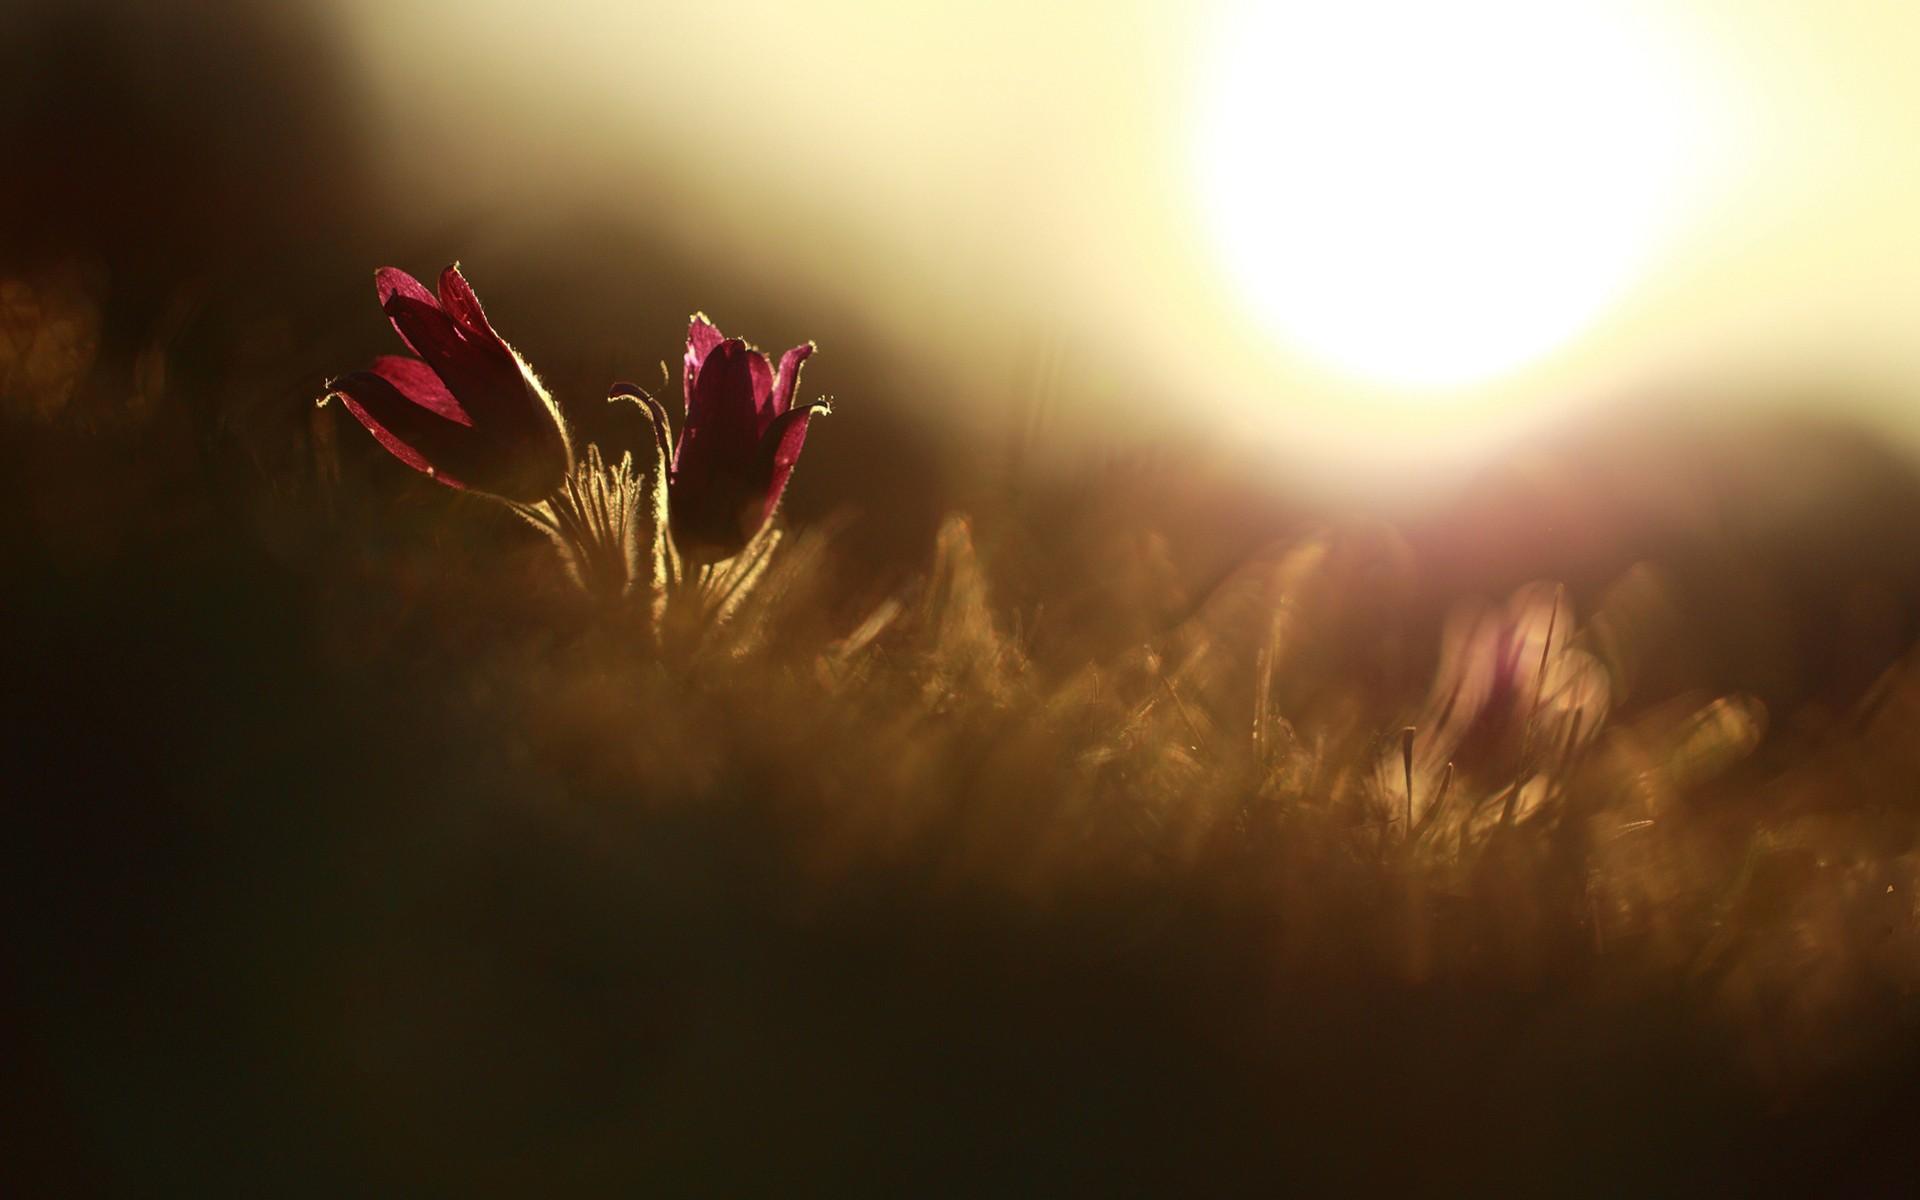 Fantastic Macro Flowers 34768 1920x1200 px